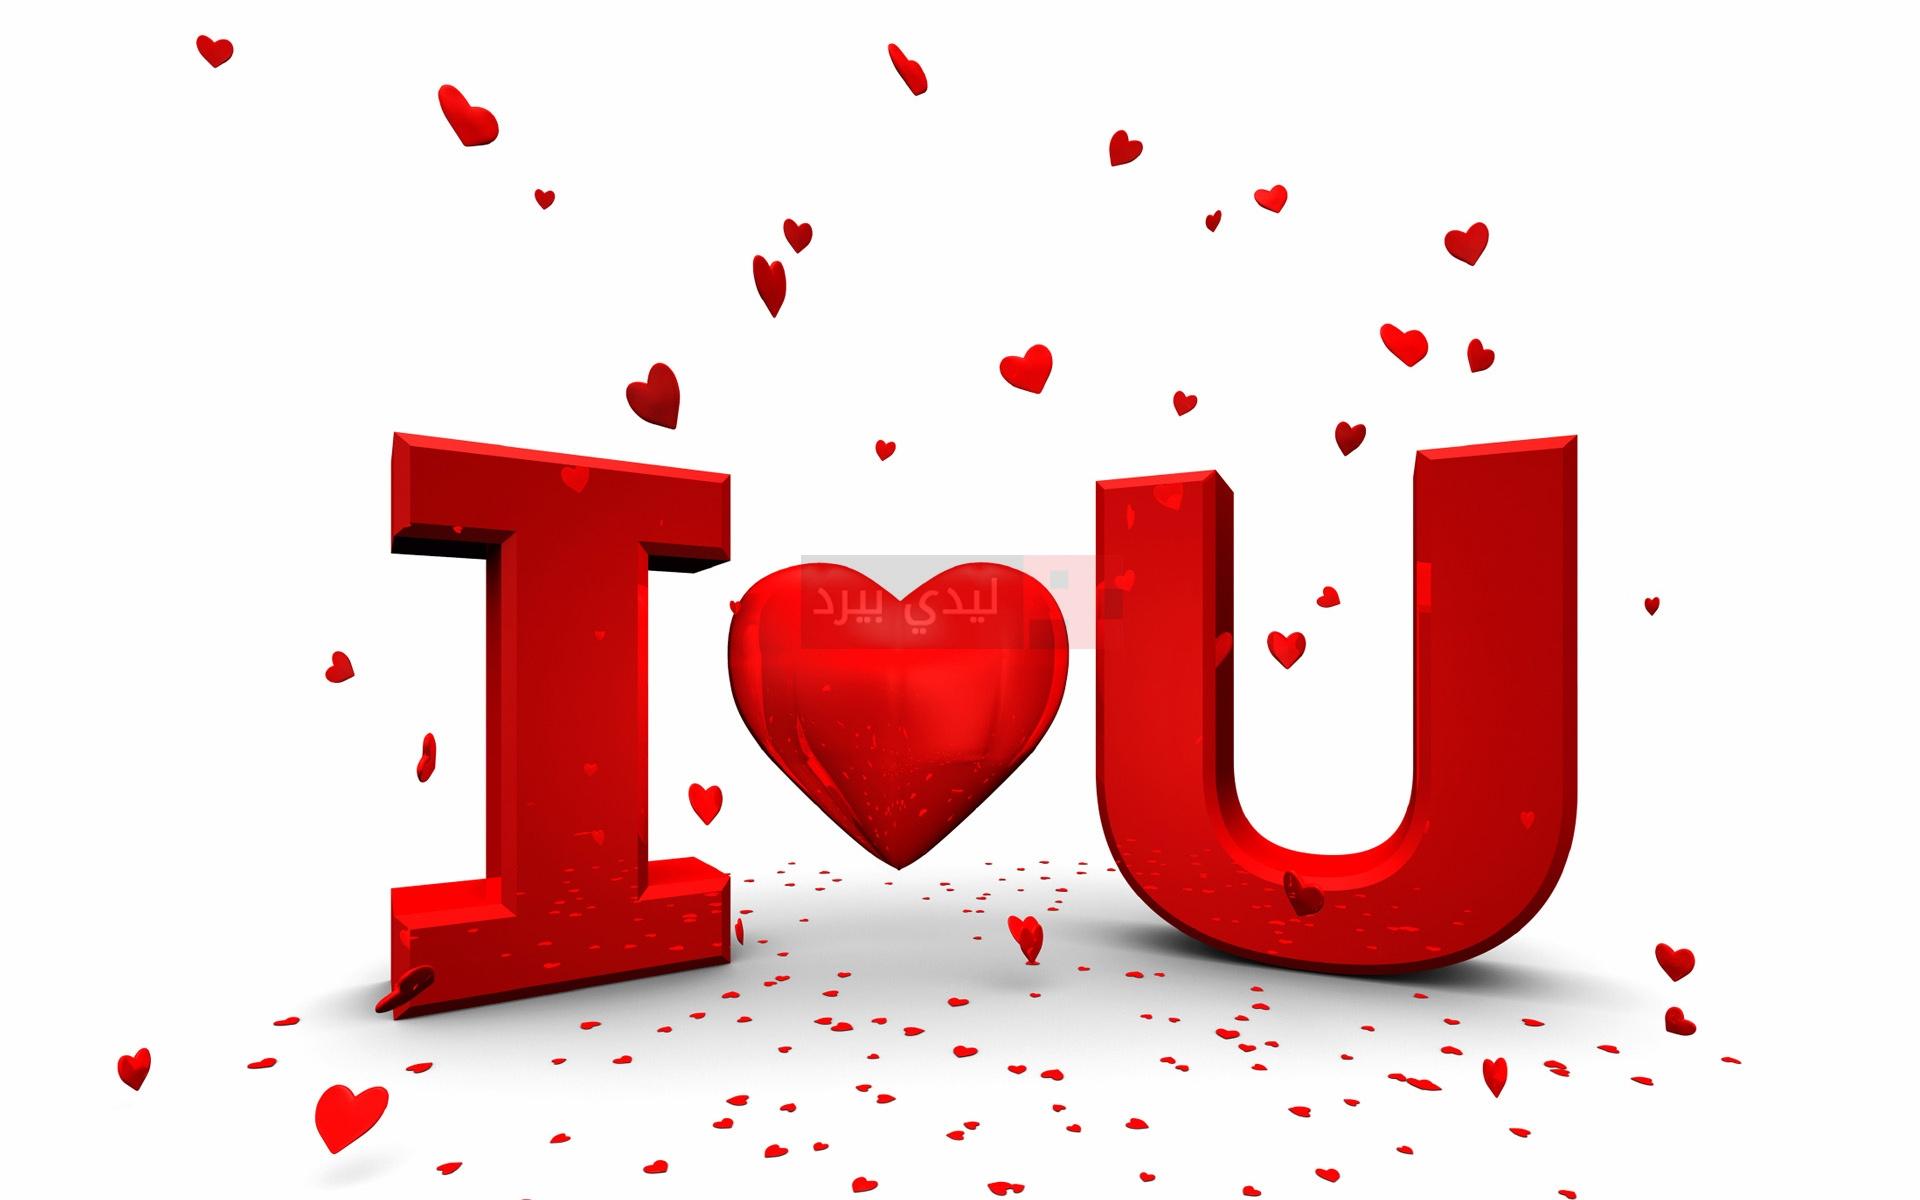 بالصور رسائل بحبك , اجمل مسجات حب 3112 6